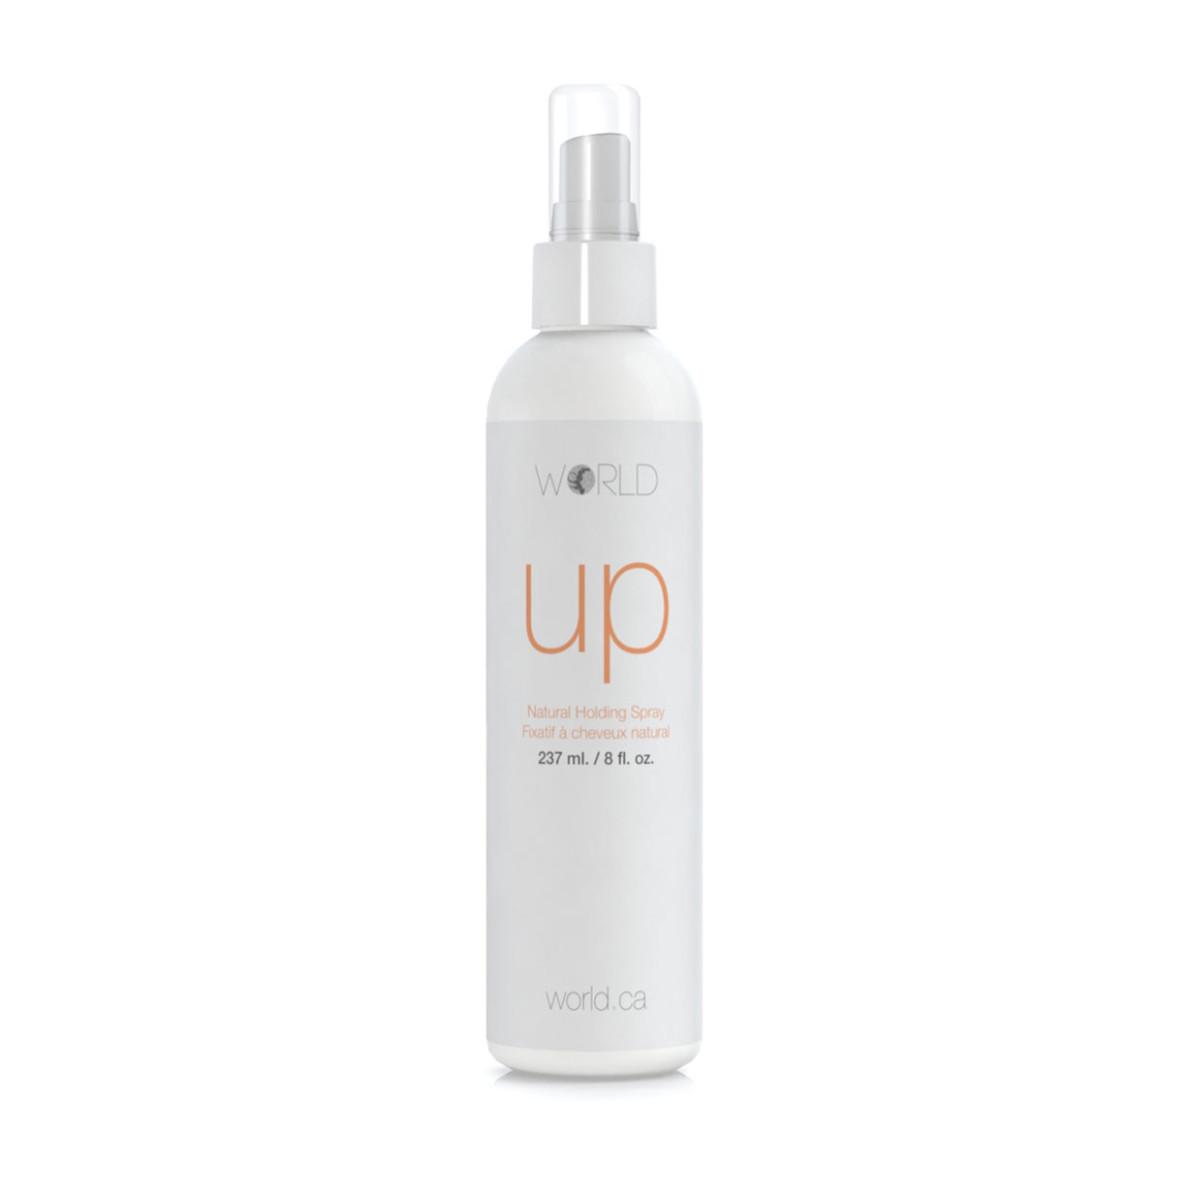 World Up Natural Holding Spray